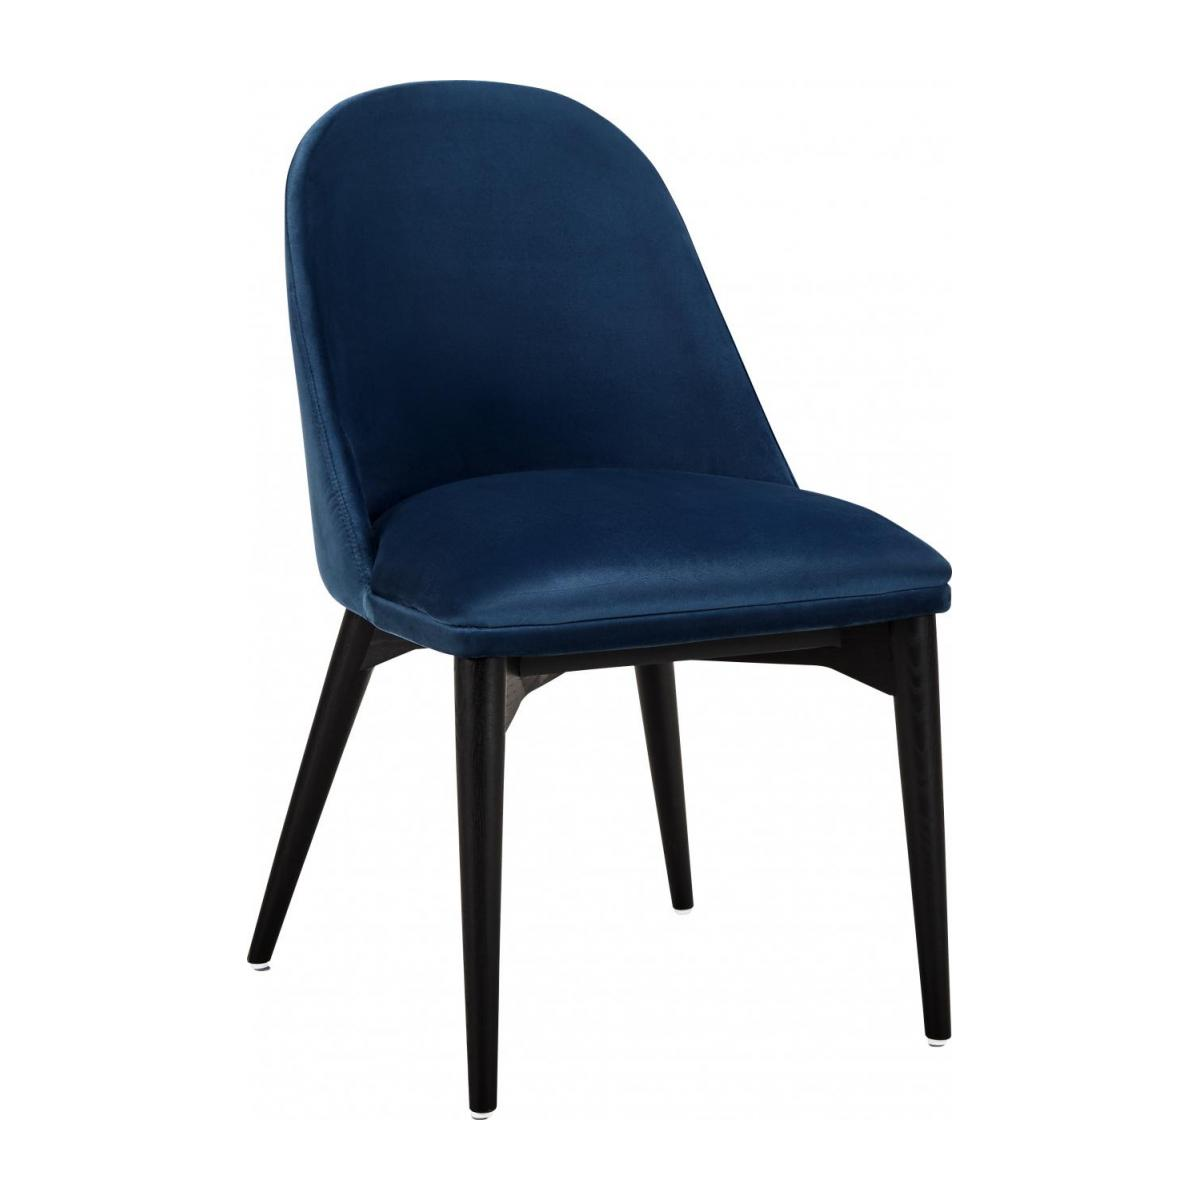 Vittorio Chaise Design en Velours Bleu Habitat